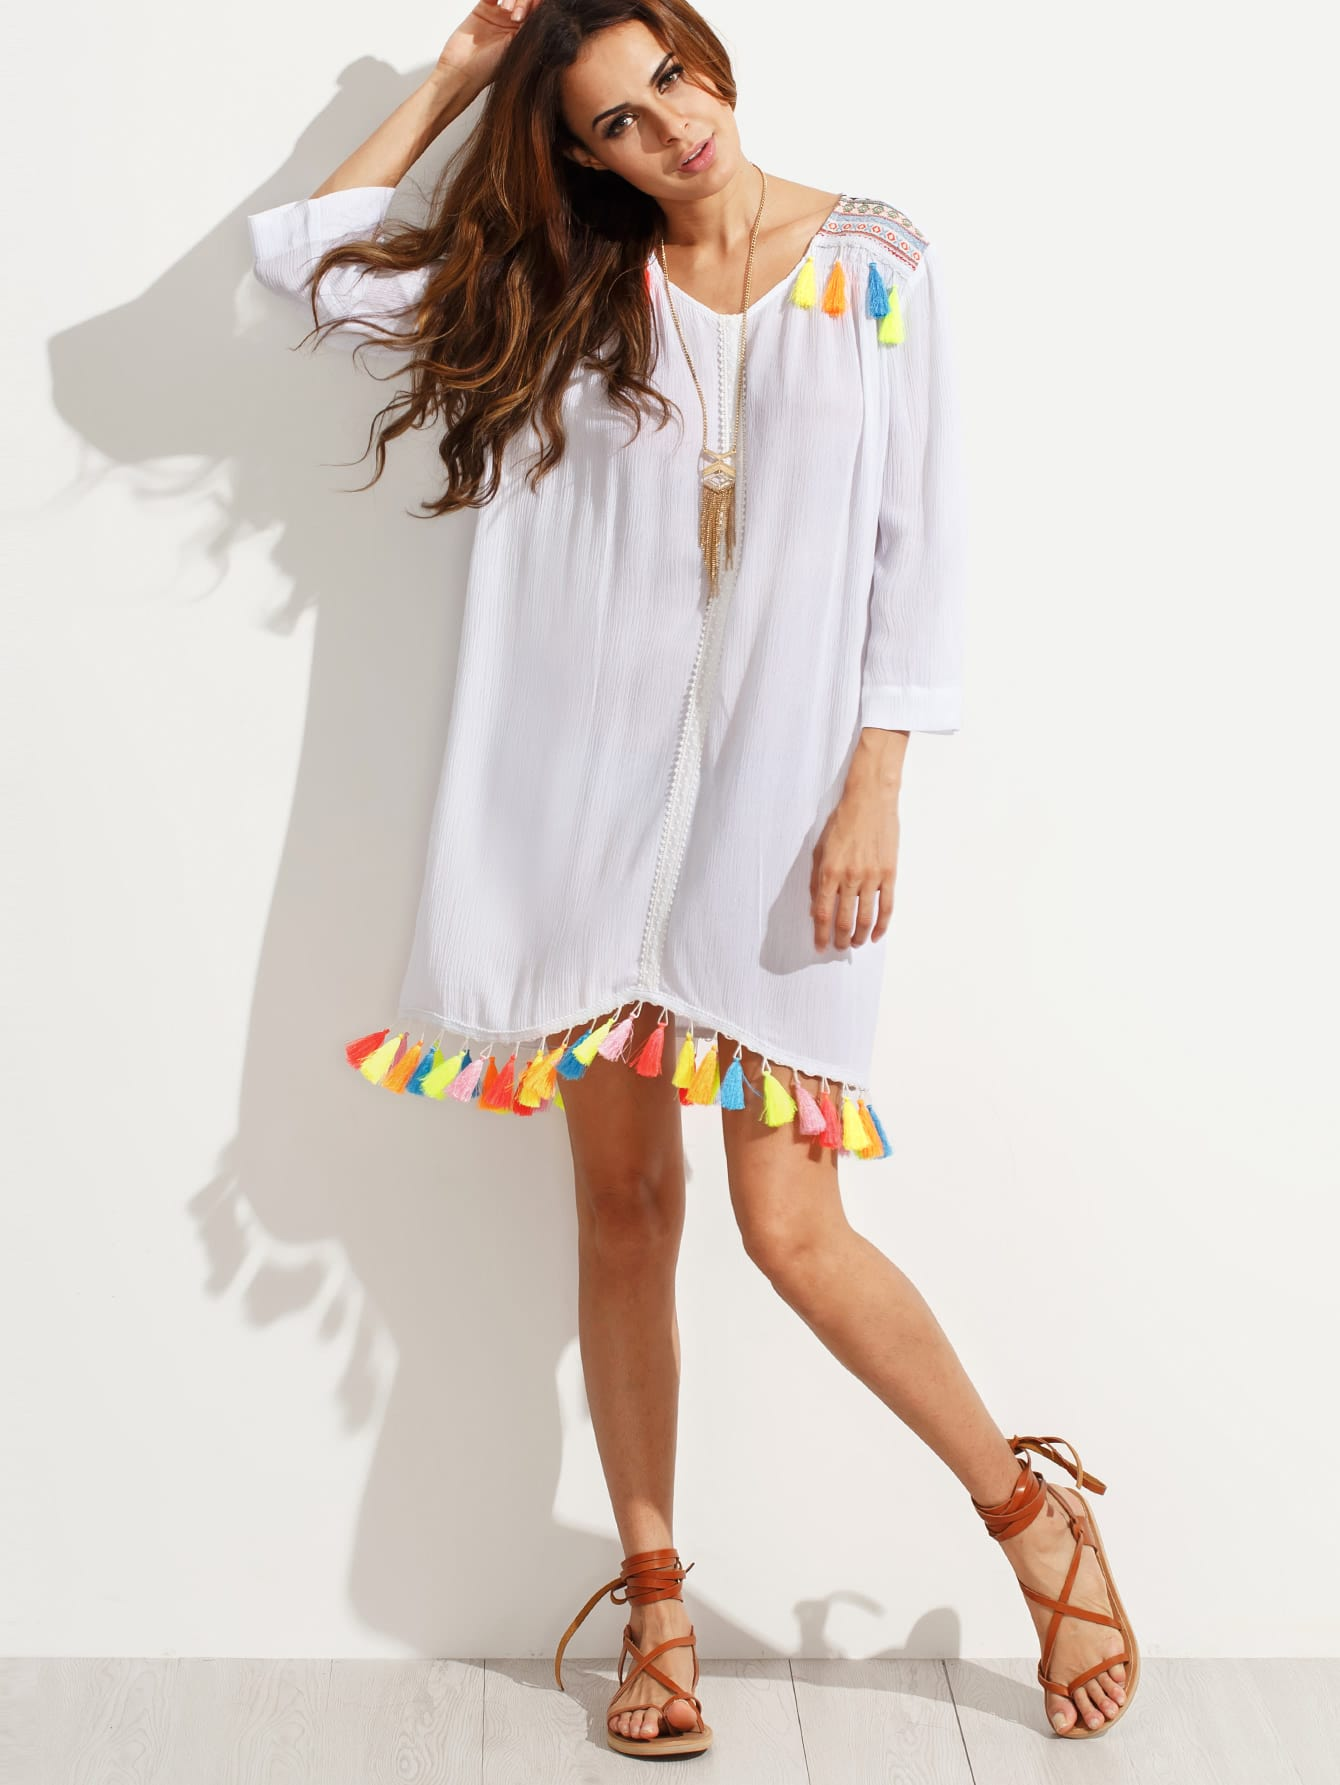 Women&-39-s Fashion Dresses- Shop Fashion Dresses Online - Romwe.com